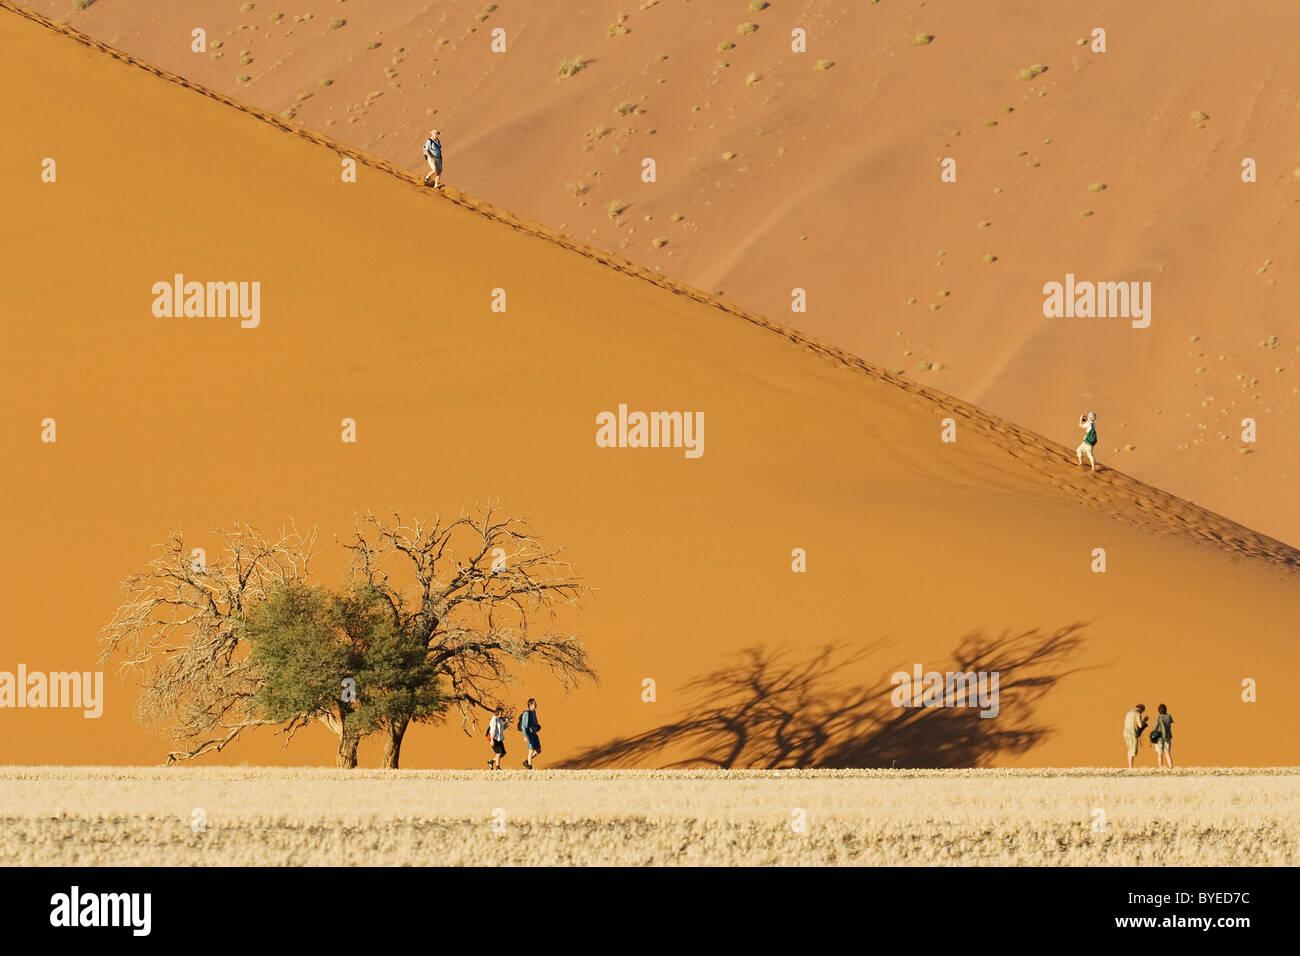 Tourists at a sand dune with Camelthorn tree (Acacia erioloba) in the Namib Desert. Namib-Naukluft Park, Namibia. - Stock Image